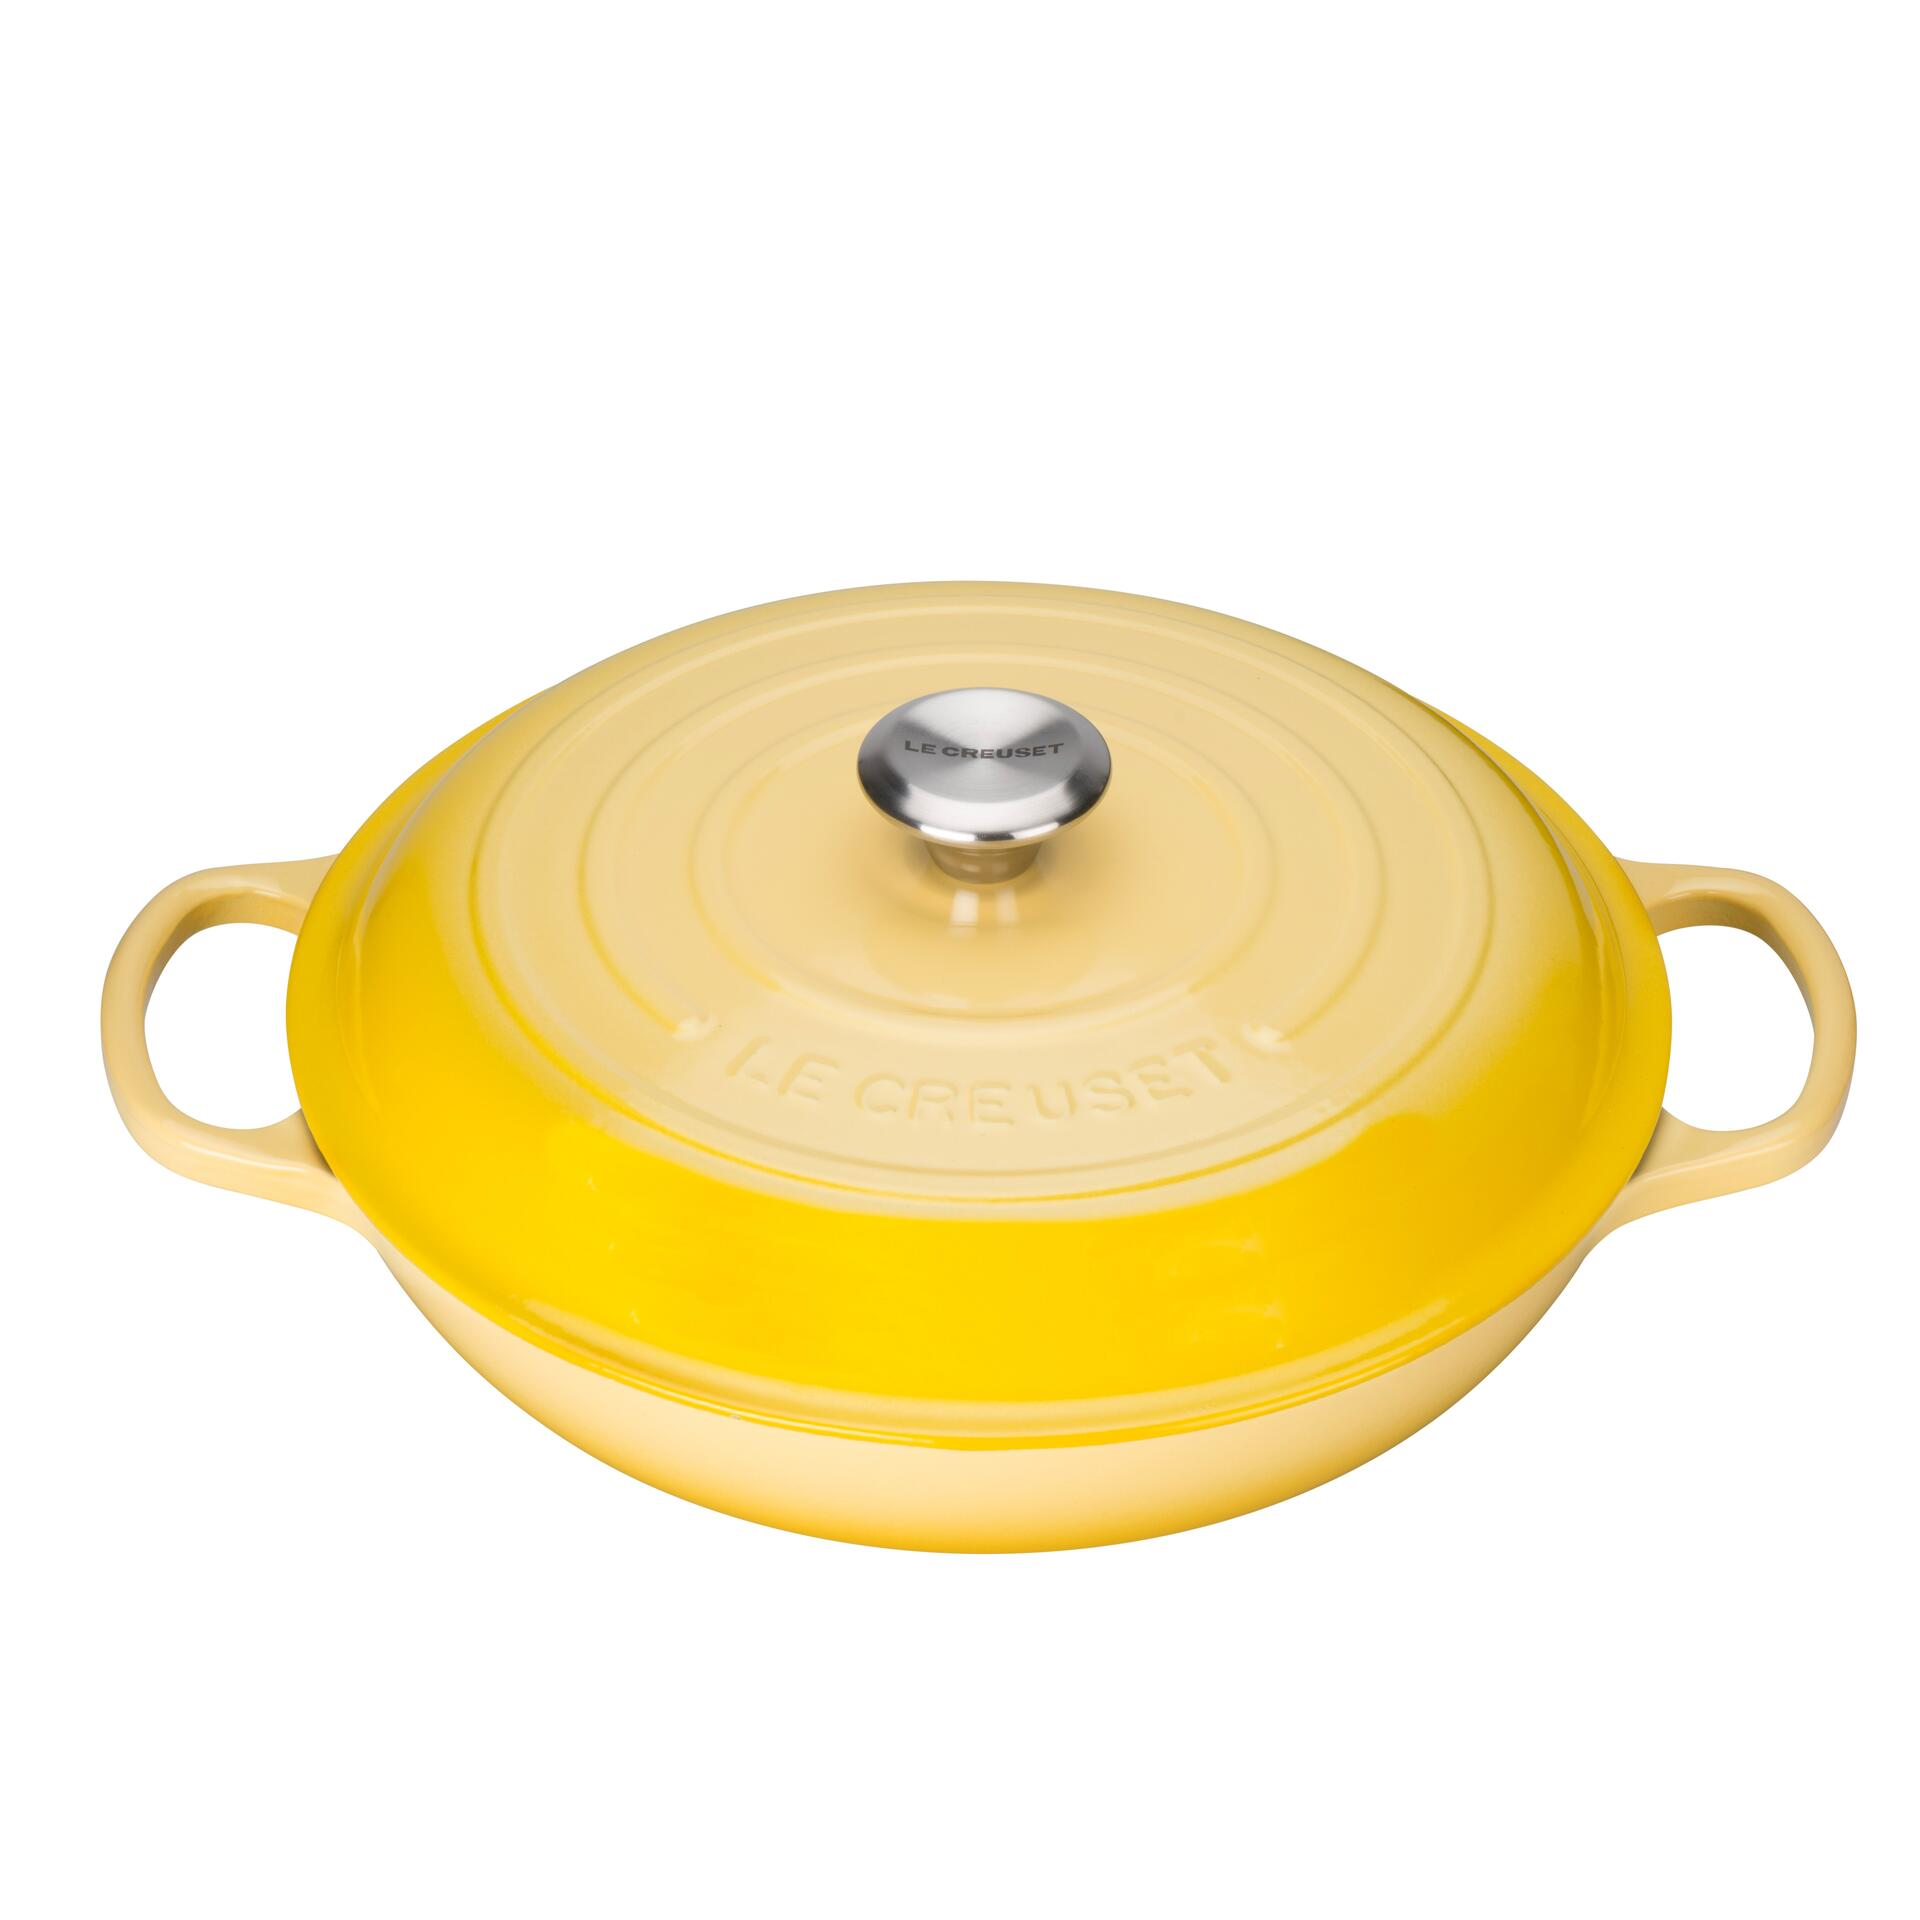 Le Creuset Gourmet Profitopf 30 cm Citrus